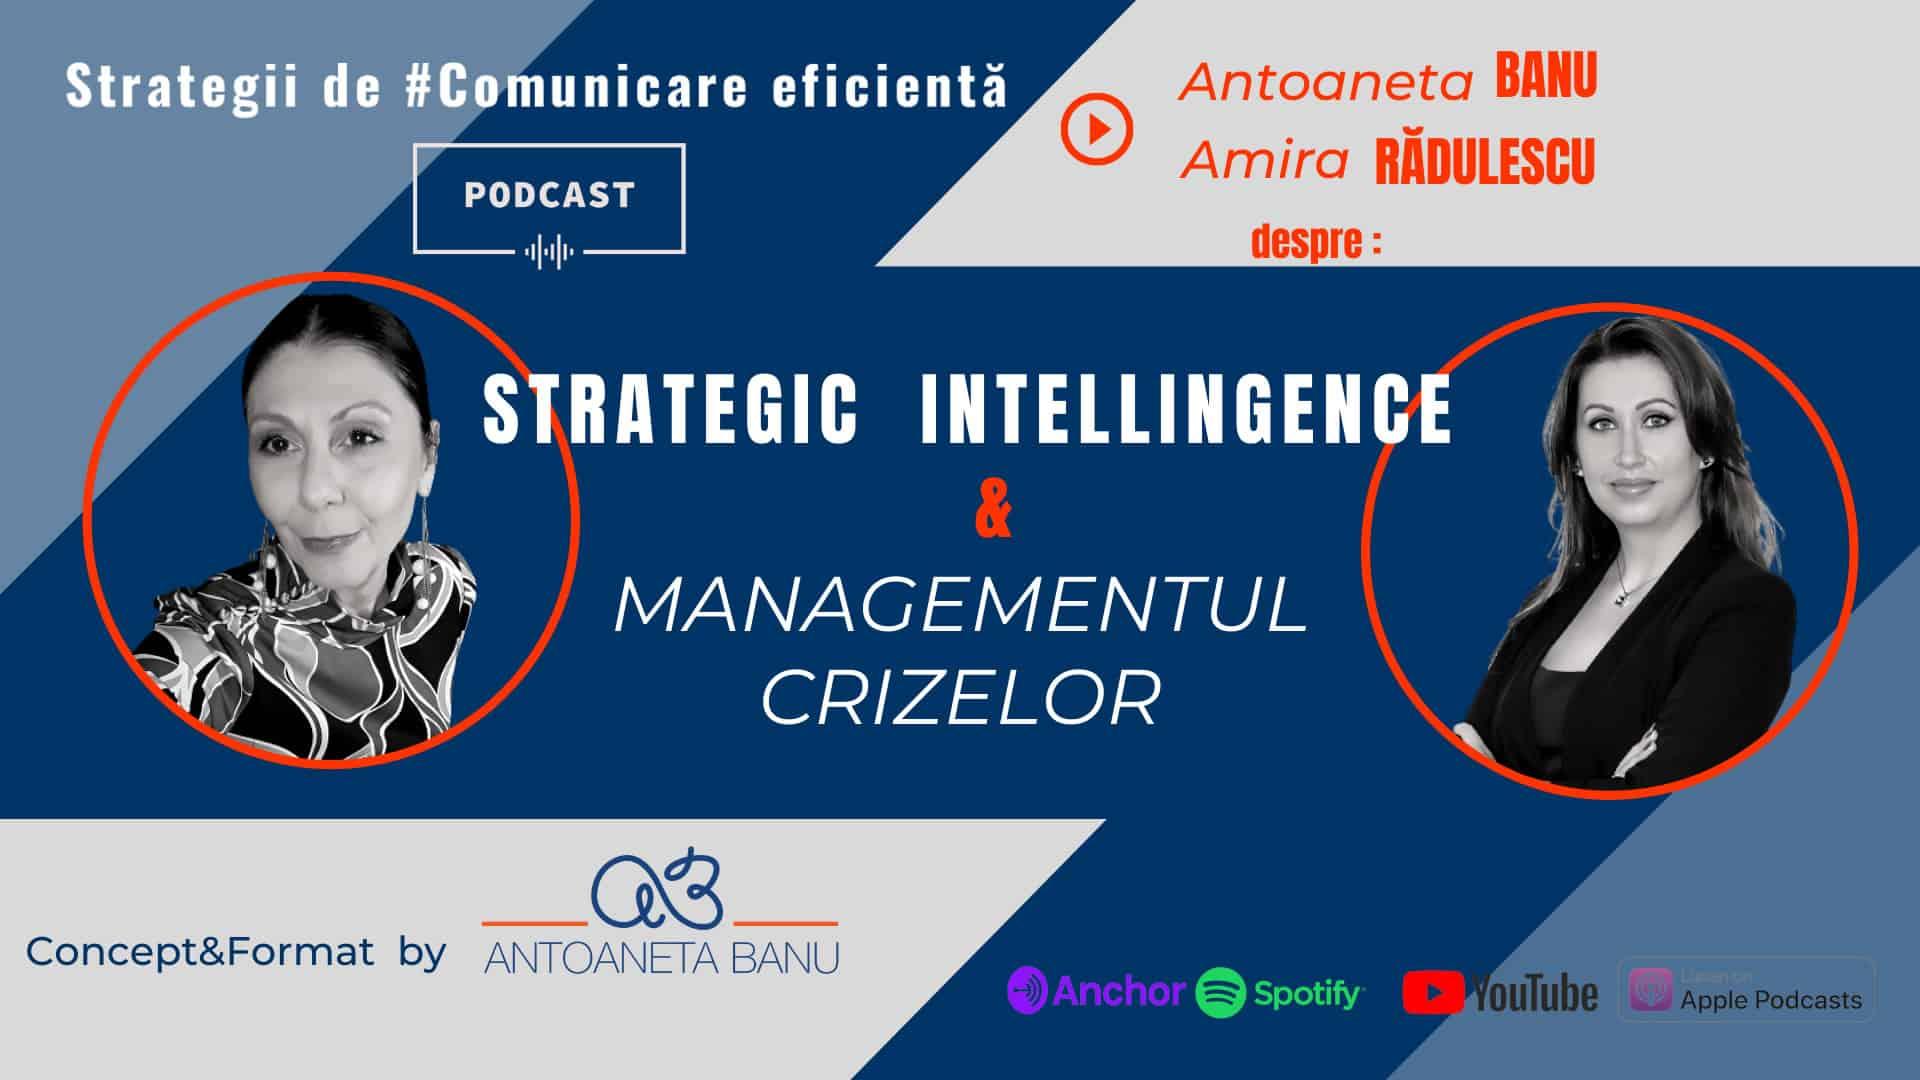 #StrategicIntelligence #ManagementulCrizelor